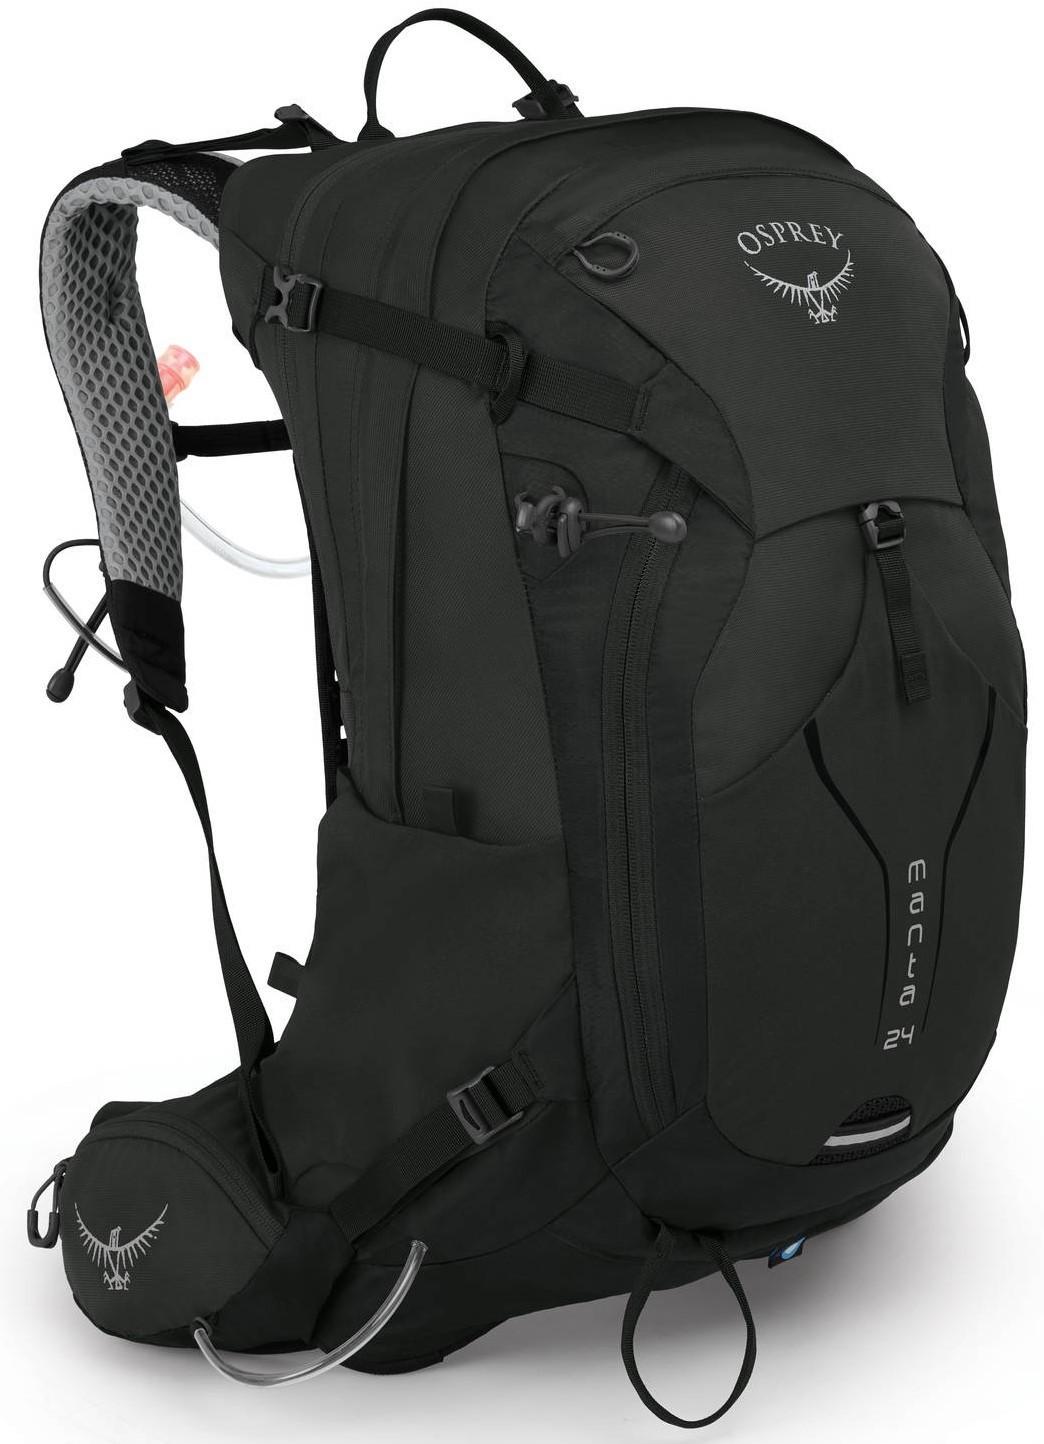 Manta Рюкзак туристический Osprey Manta 24 Black Manta_24_S19_Side_Black_web.jpg